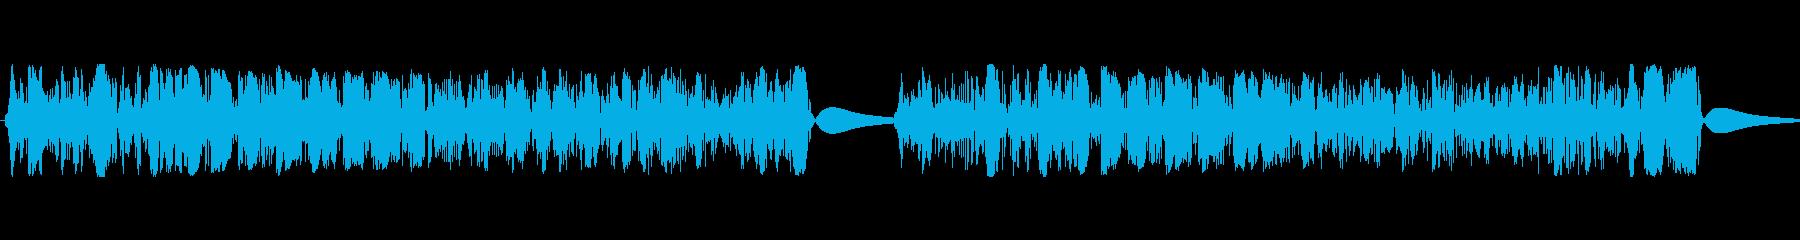 SynthVarious EC05...の再生済みの波形